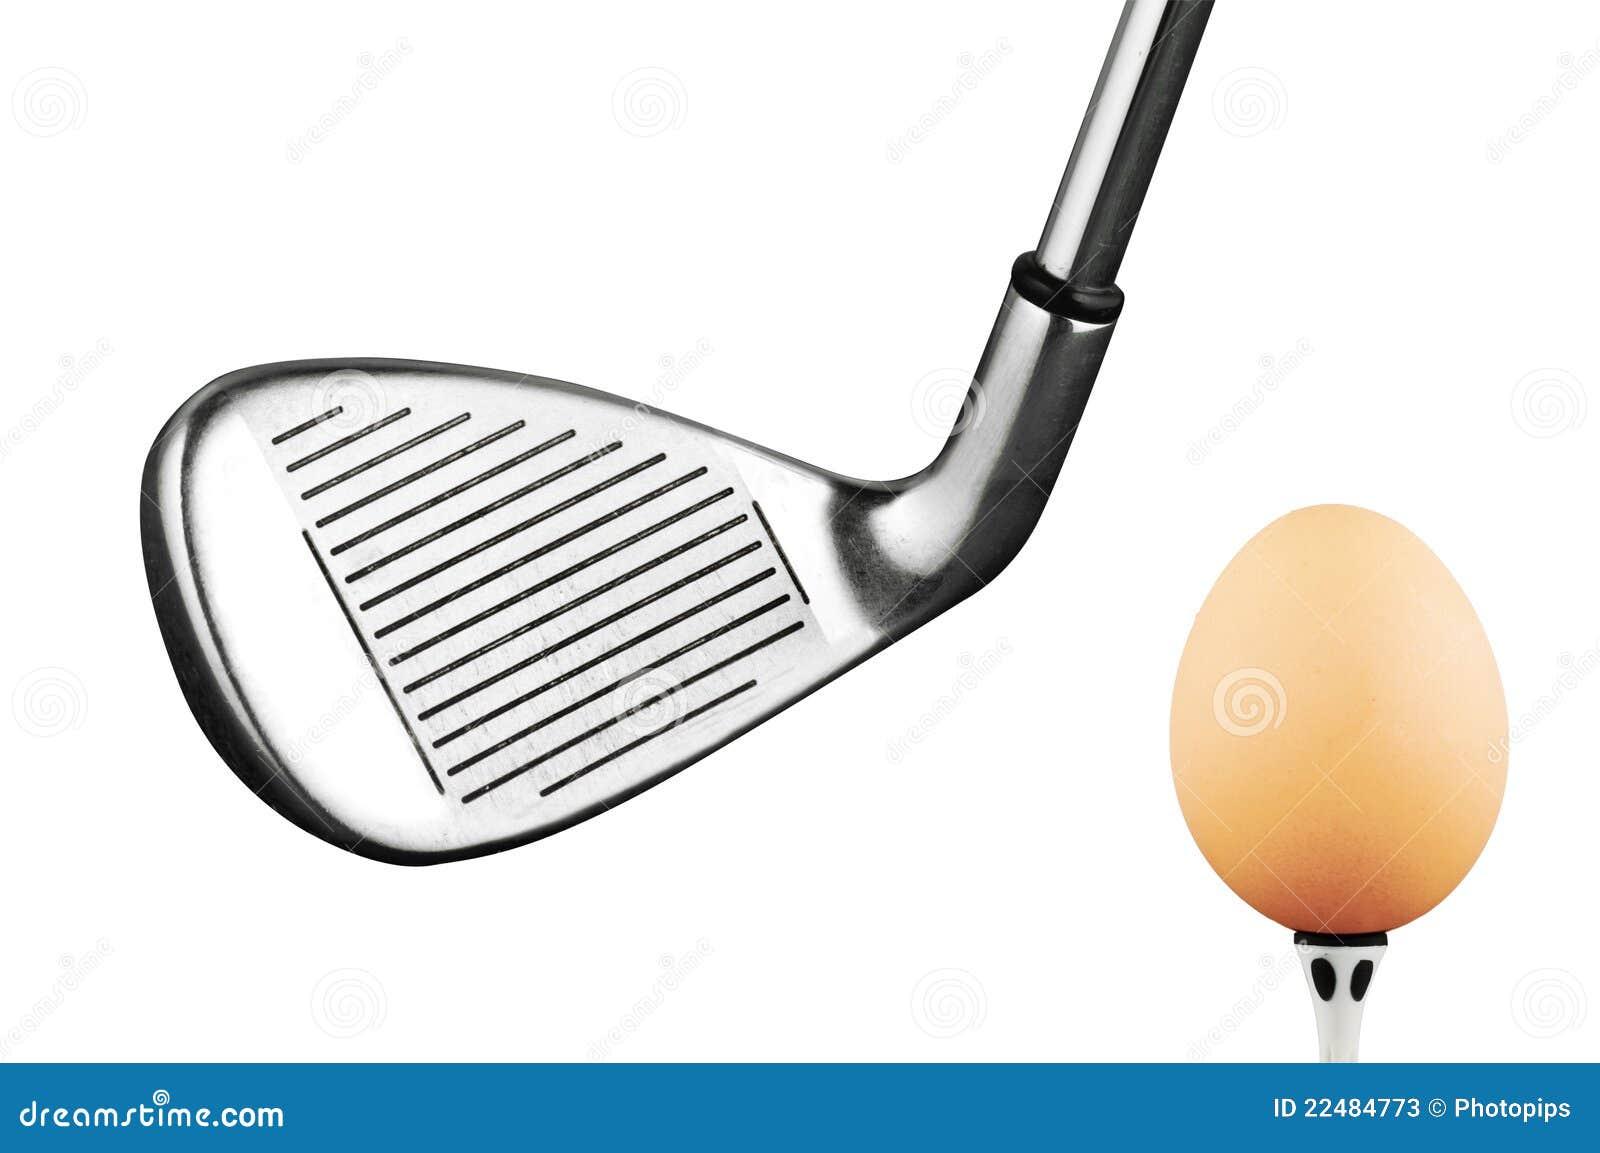 Stock Photos  Golf iron club and eggGolf Club Iron